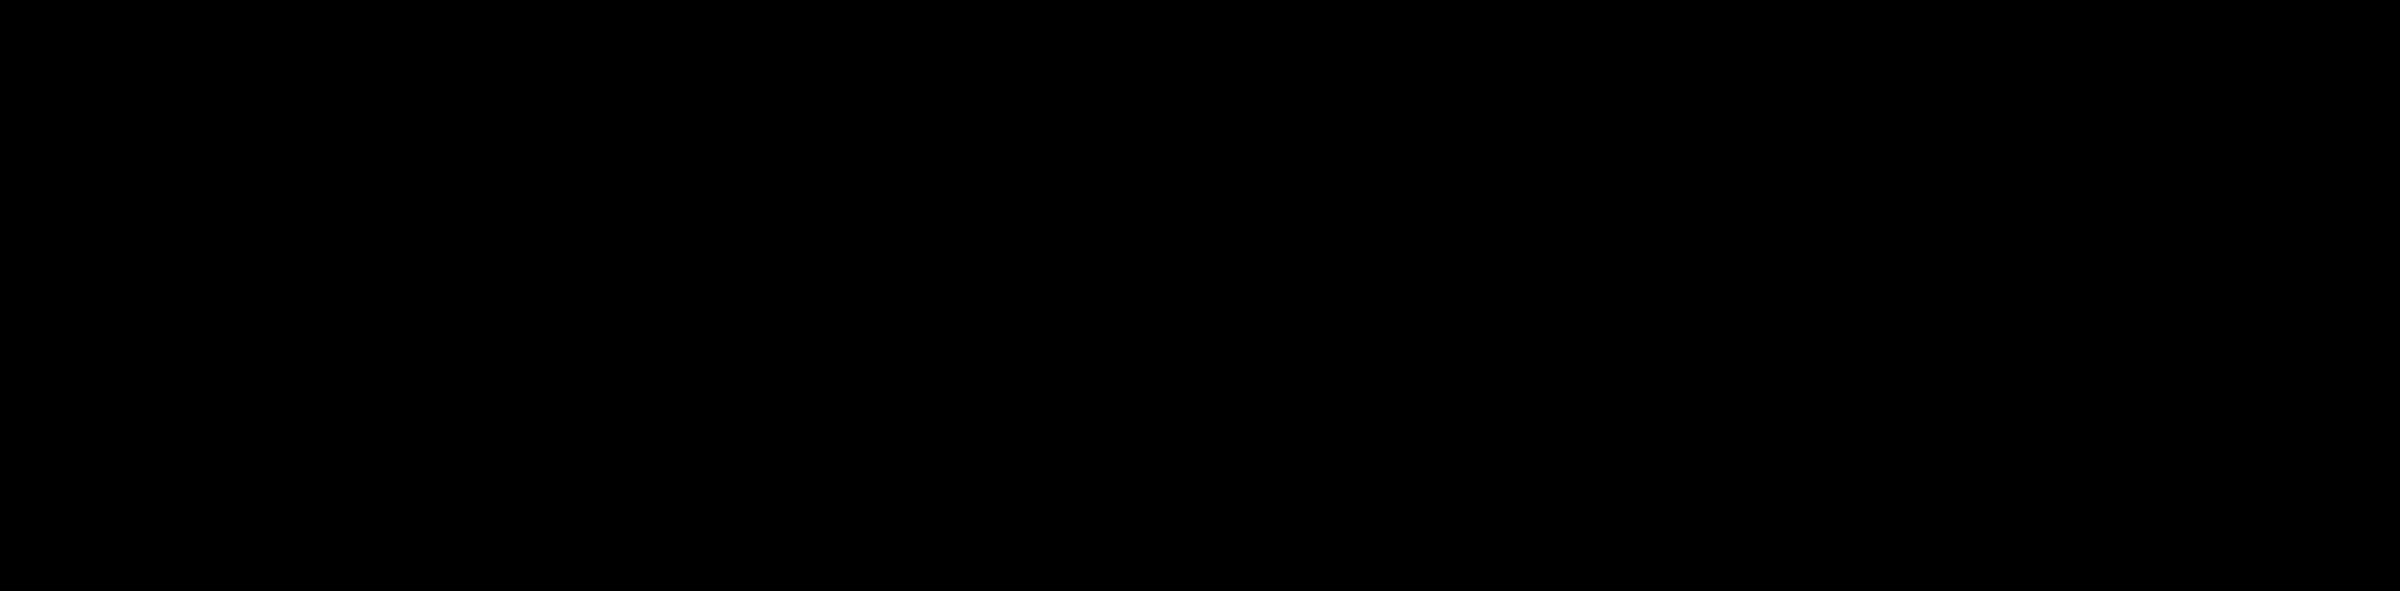 heineken logo png white wwwpixsharkcom images